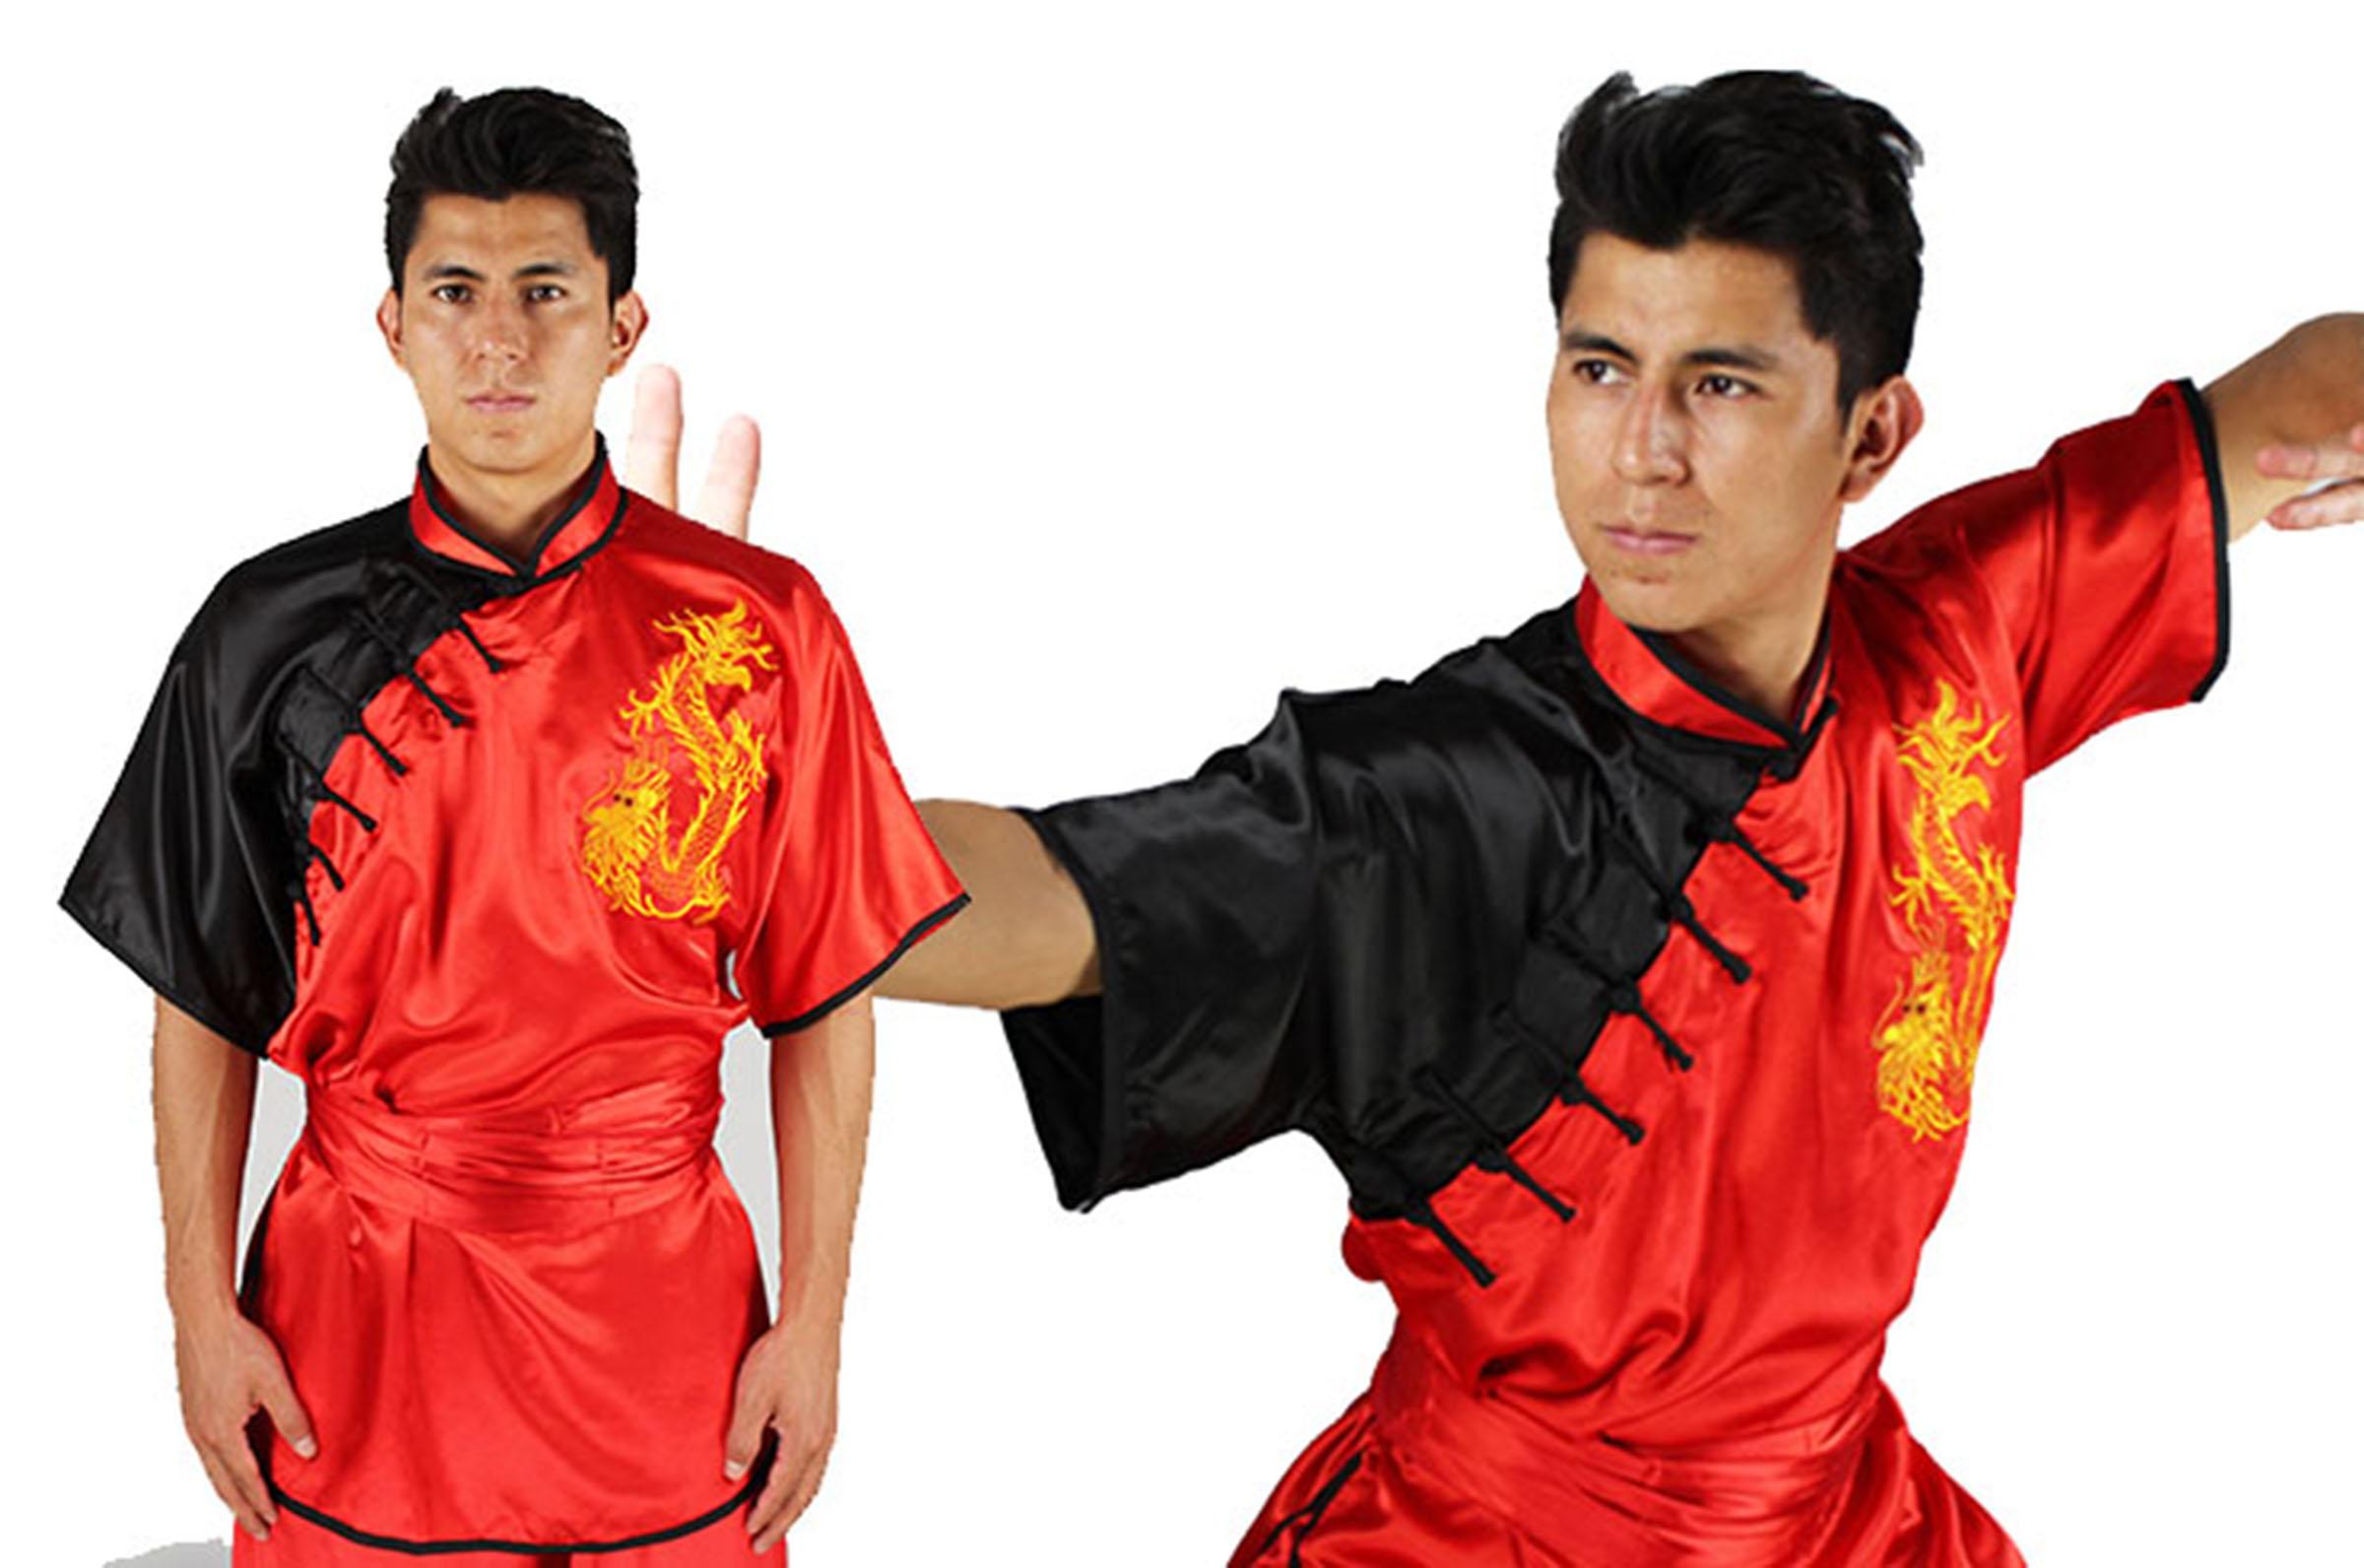 Uniforme Kimono Kung Fu Chang Quan Shan Xi Amarillo Drago Bordado Other Combat Sport Supplies